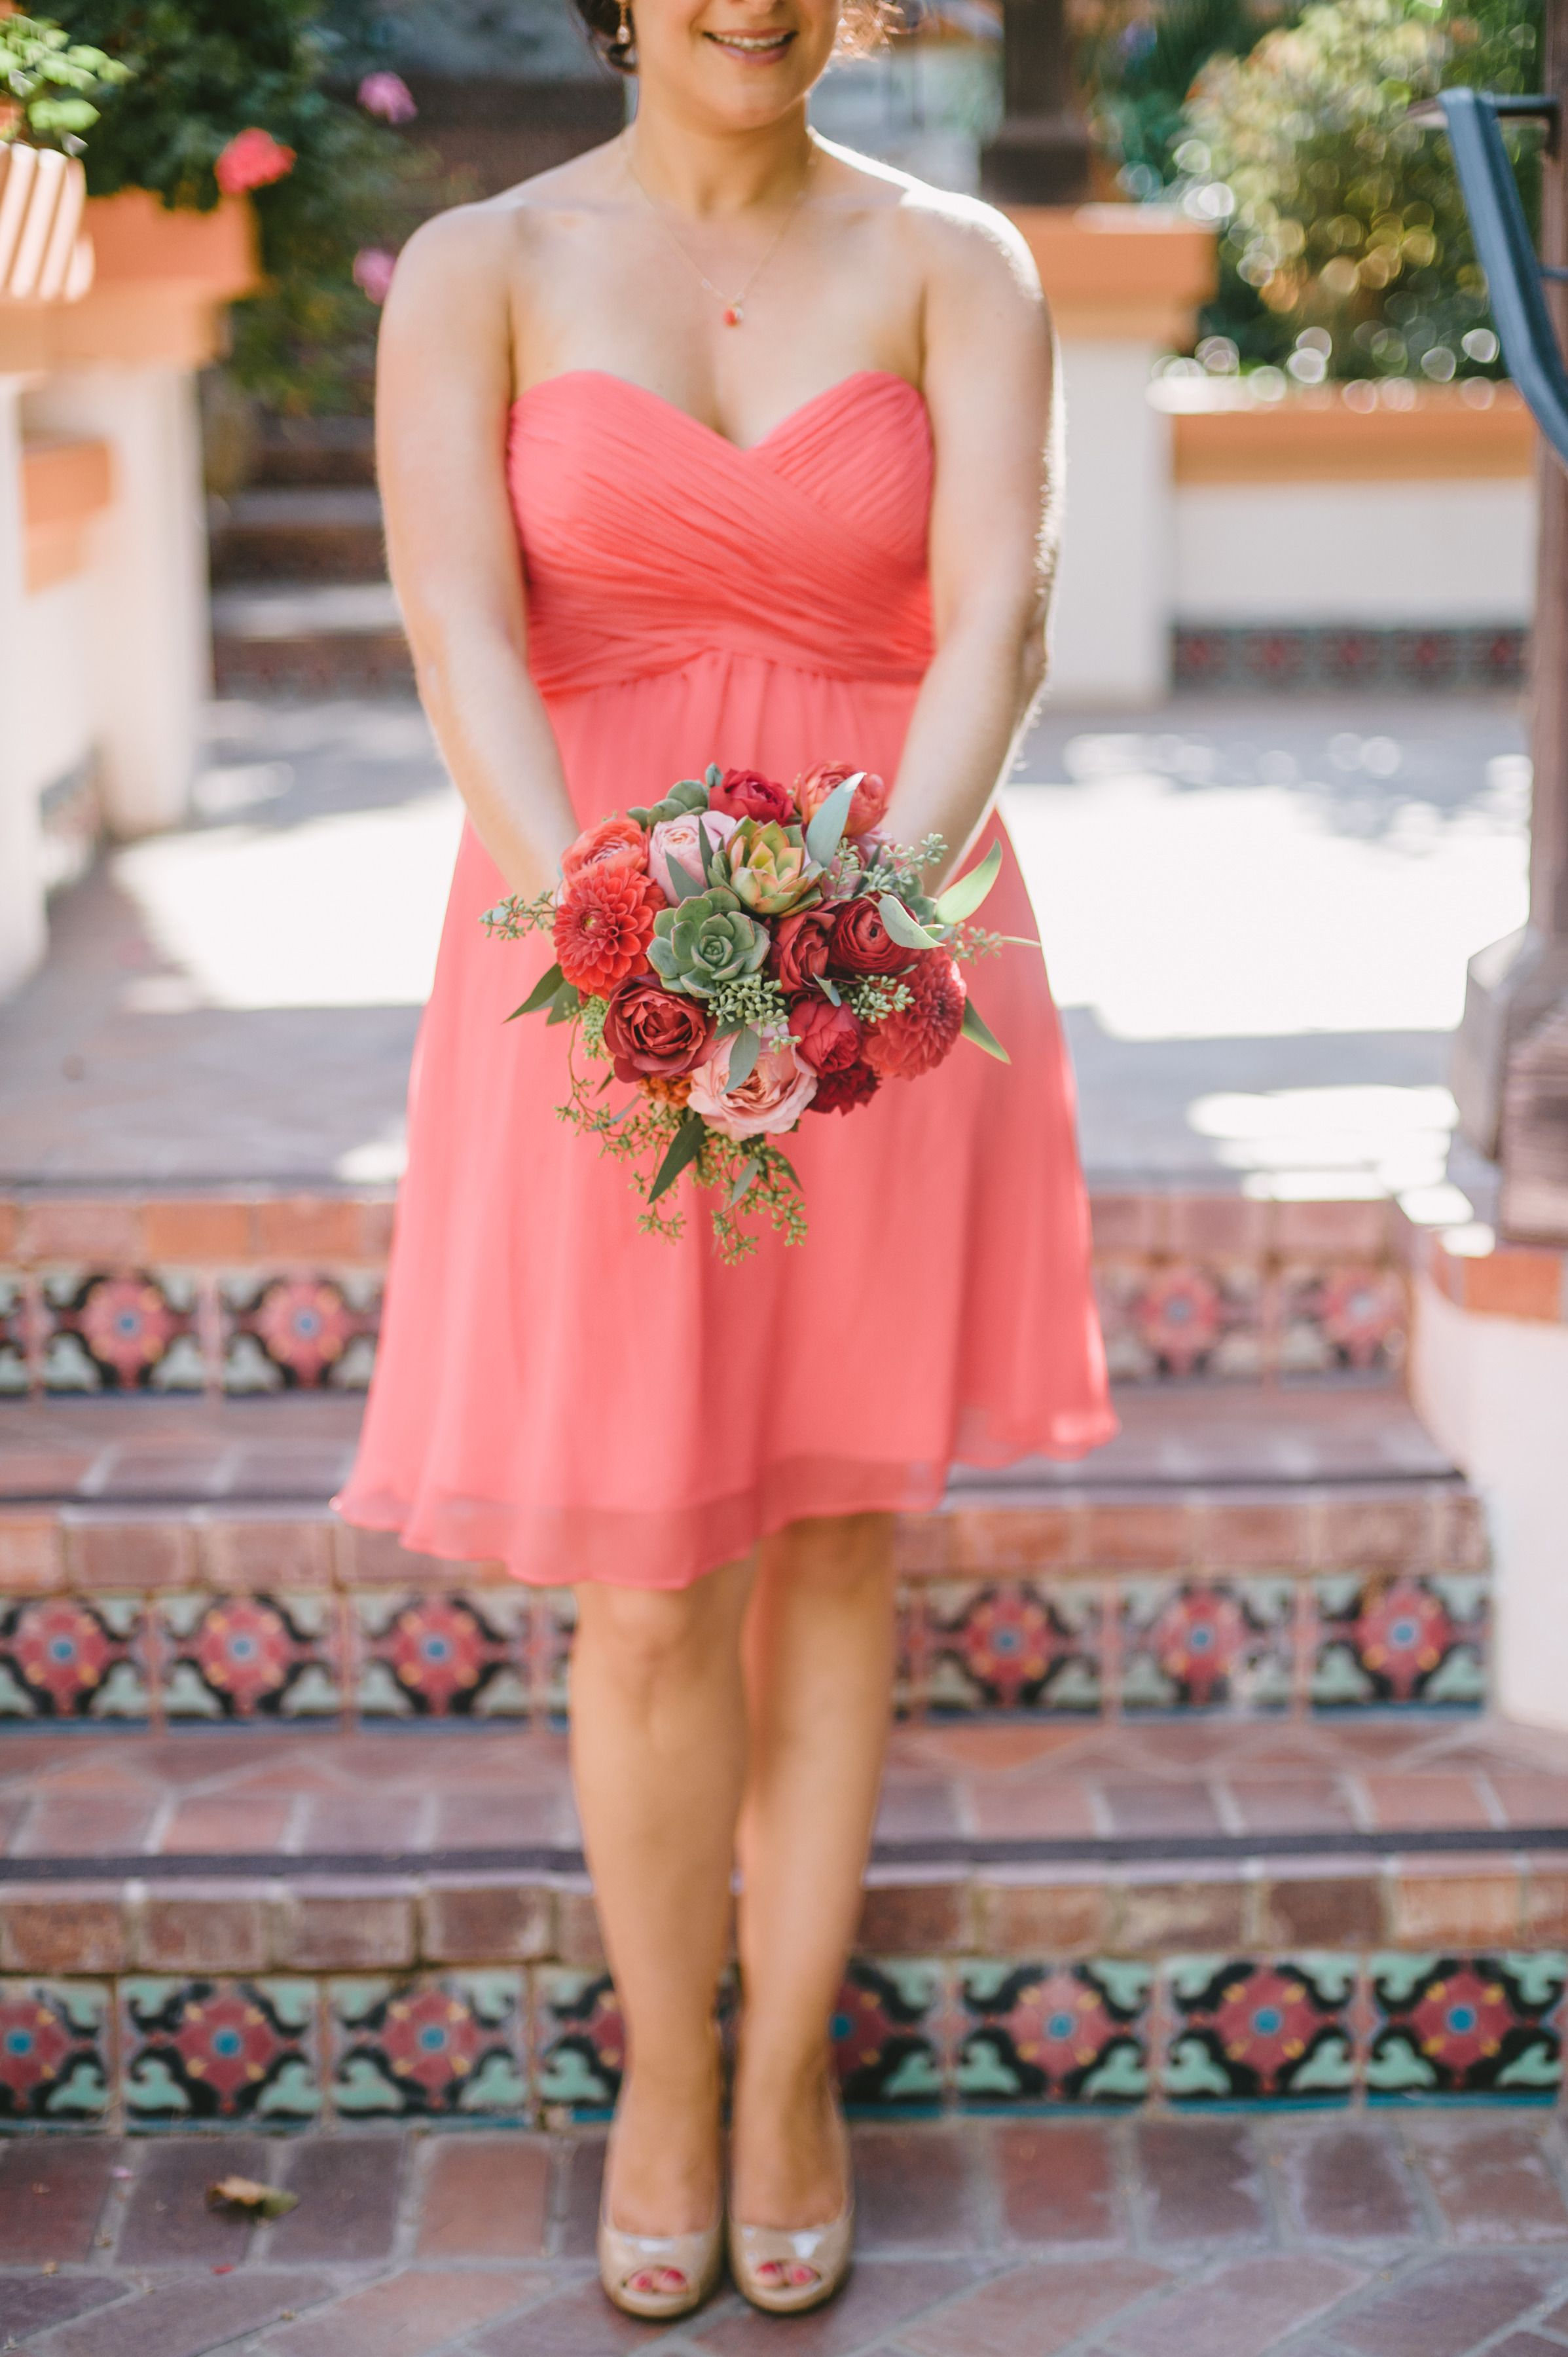 Rustic California Celebration Layered with Pink | Vestido de bodas ...